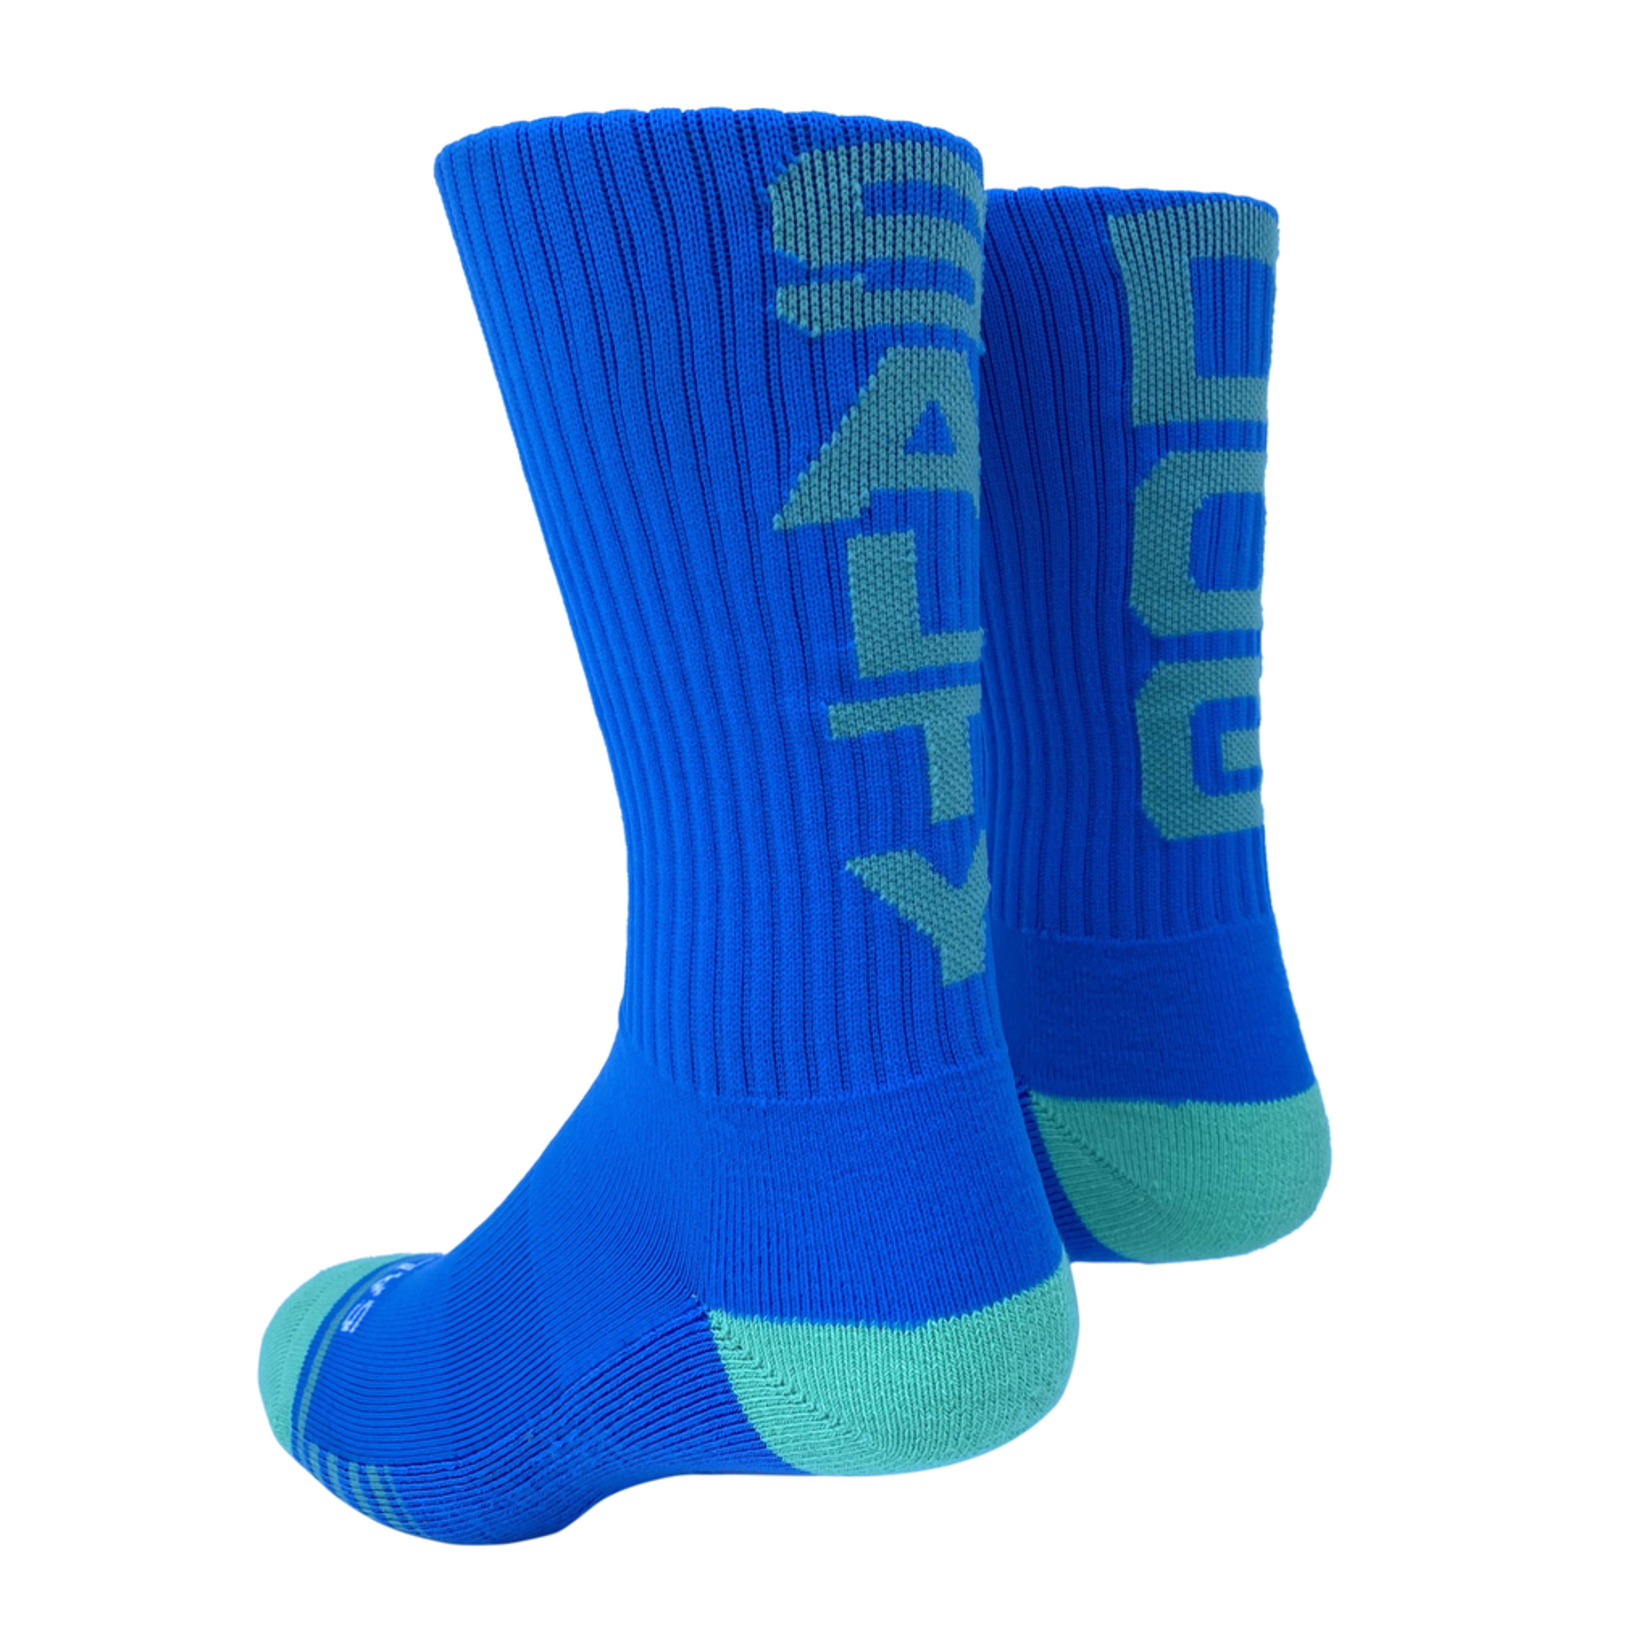 Socks-Salty Dog, ED/SG, OSFA